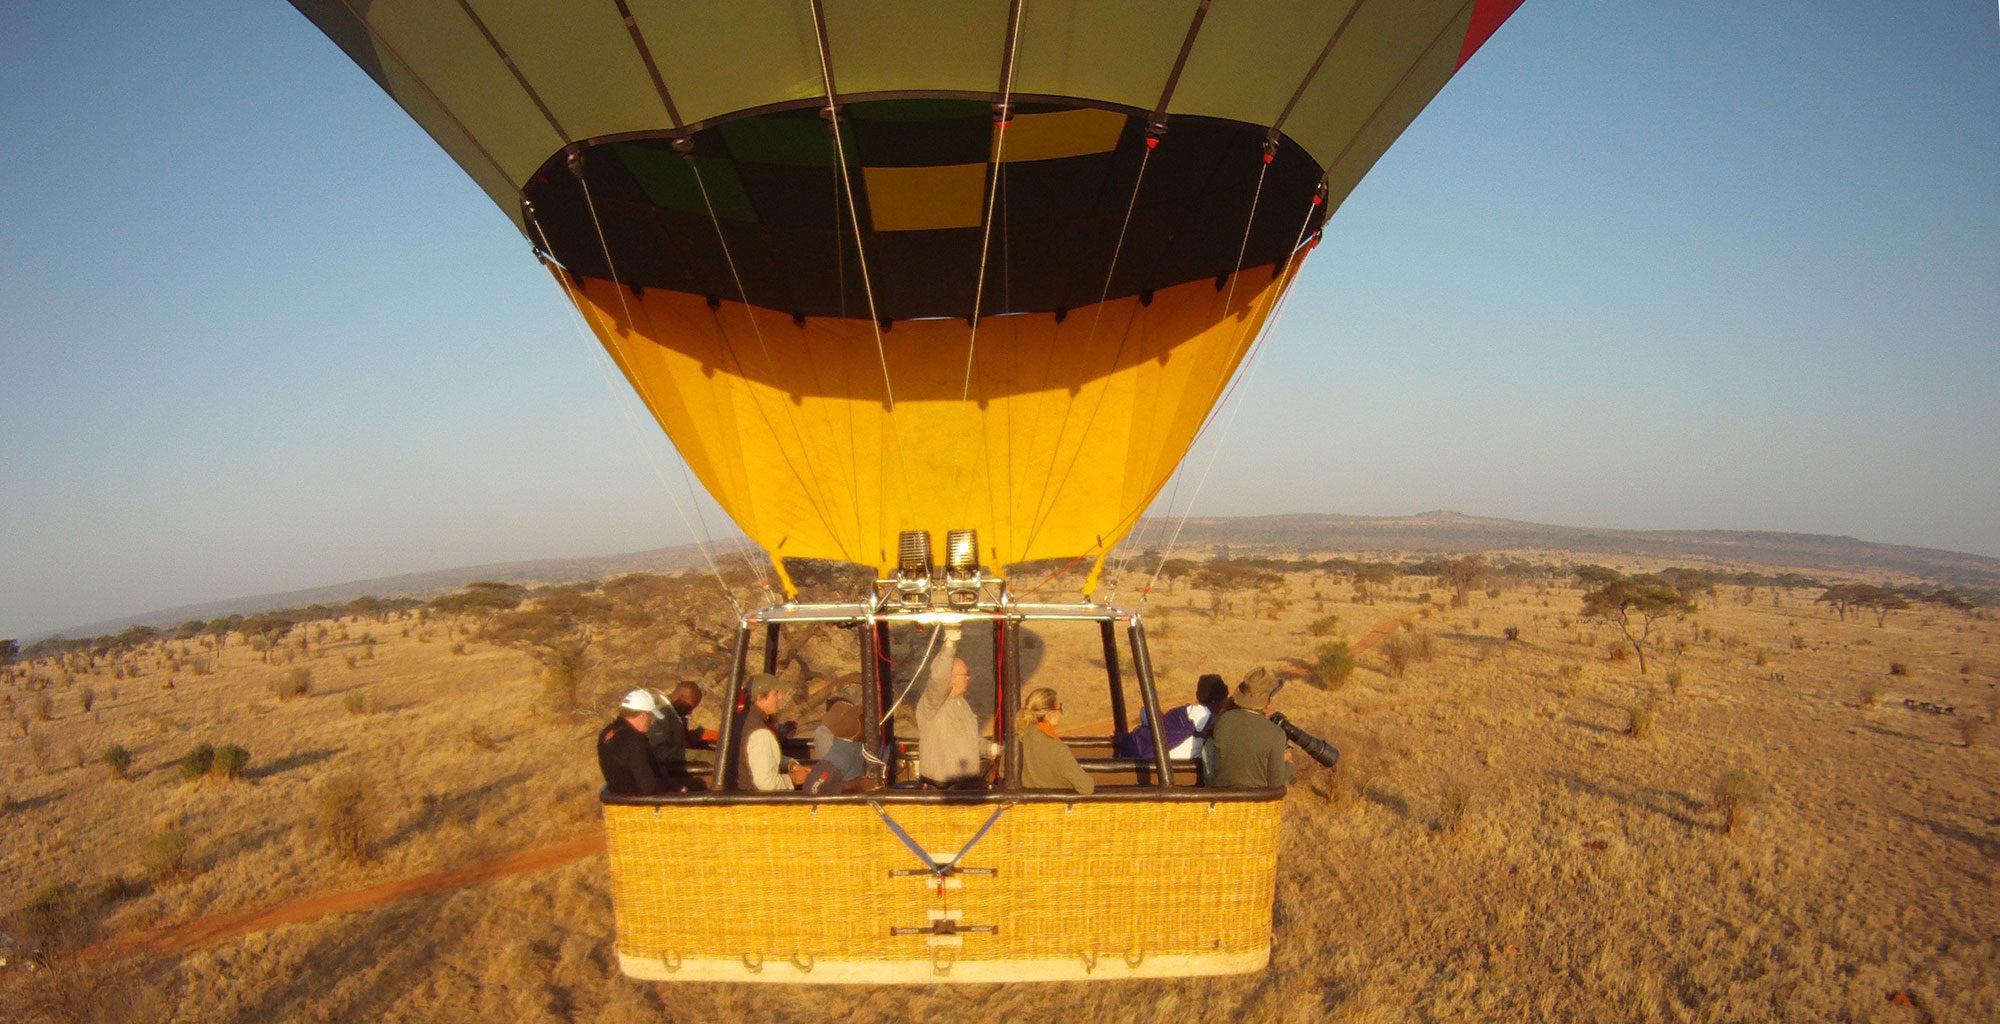 Tanzania-Tarangire-Ballooning